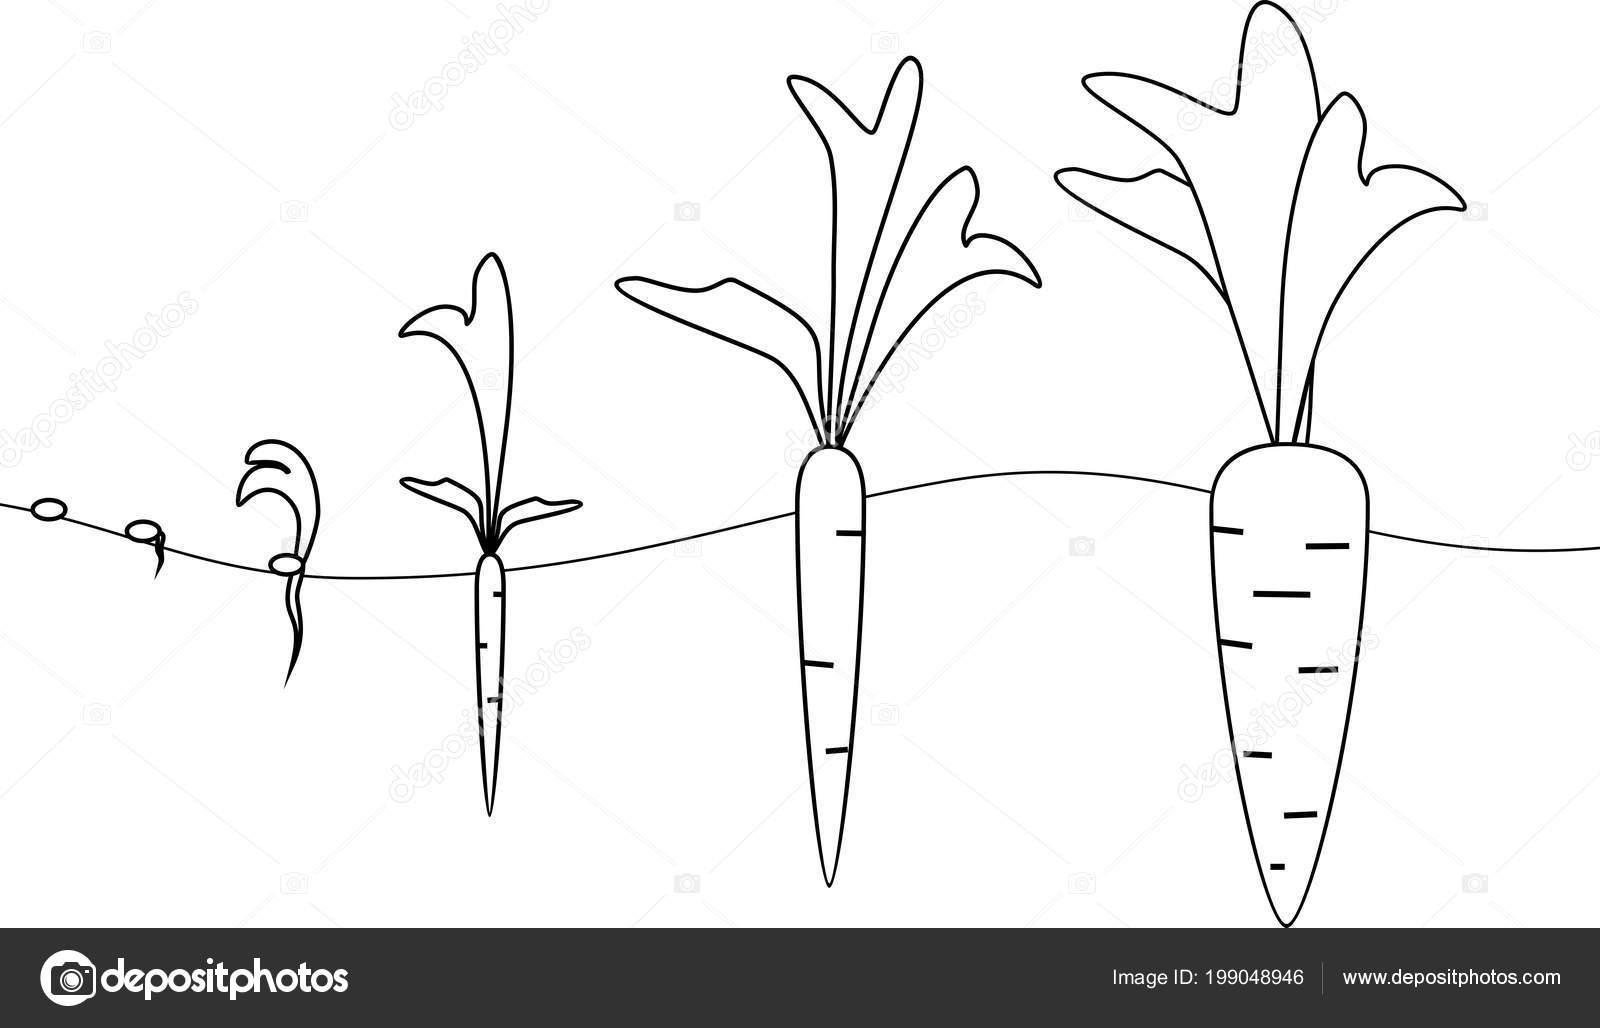 Imágenes Zanahoria Para Iluminar Etapas Crecimiento Zanahoria